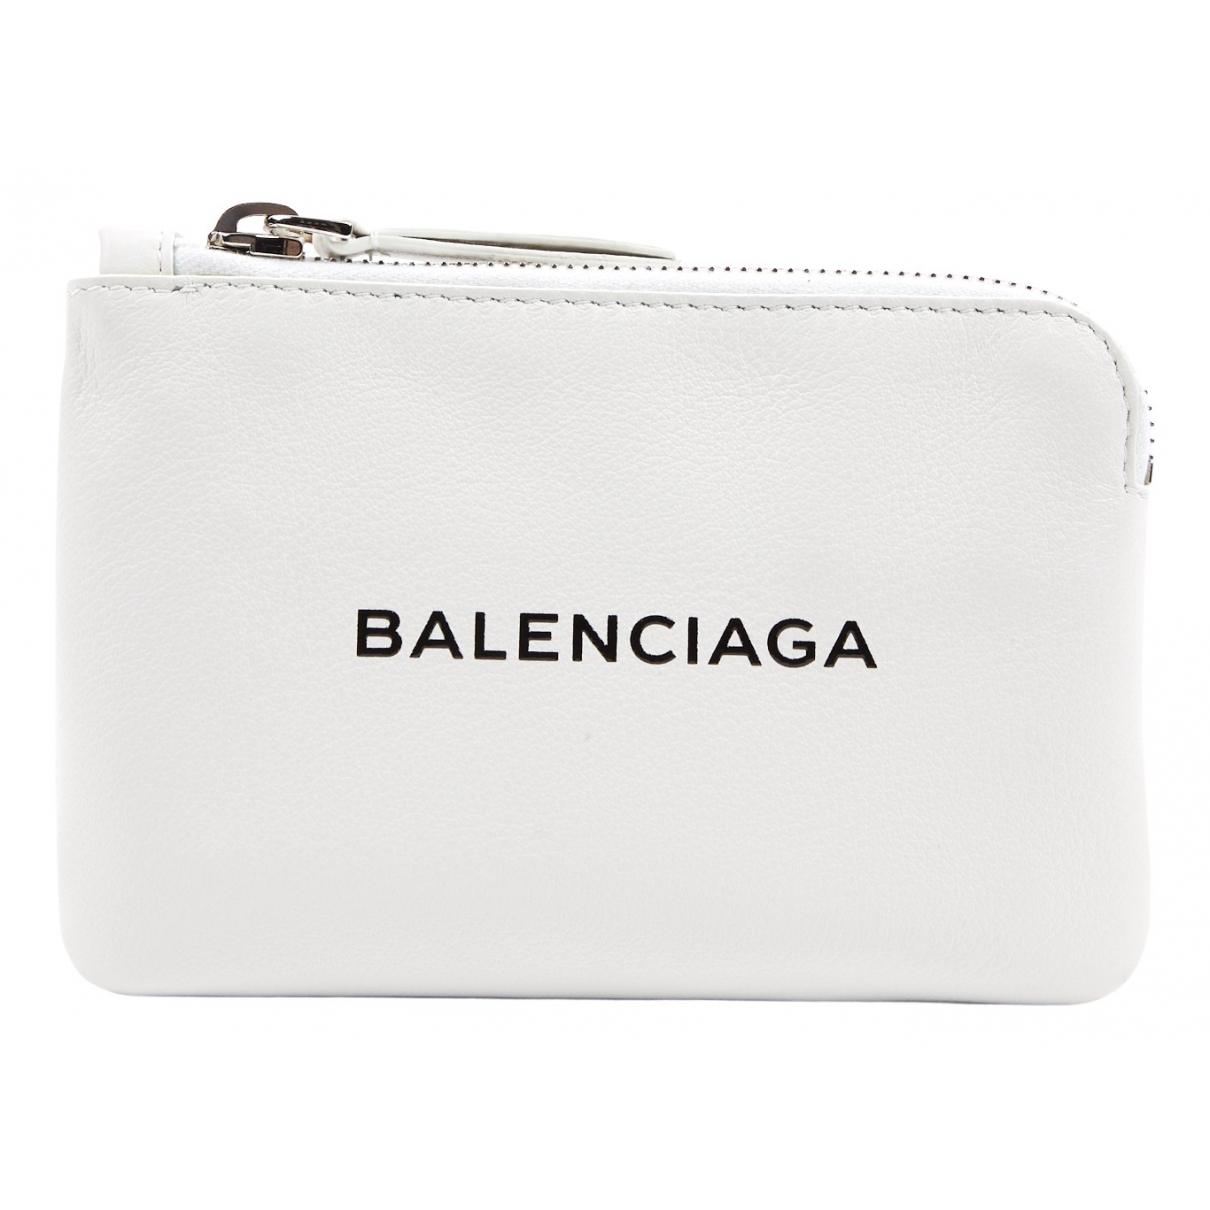 Balenciaga N White Leather Purses, wallet & cases for Women N